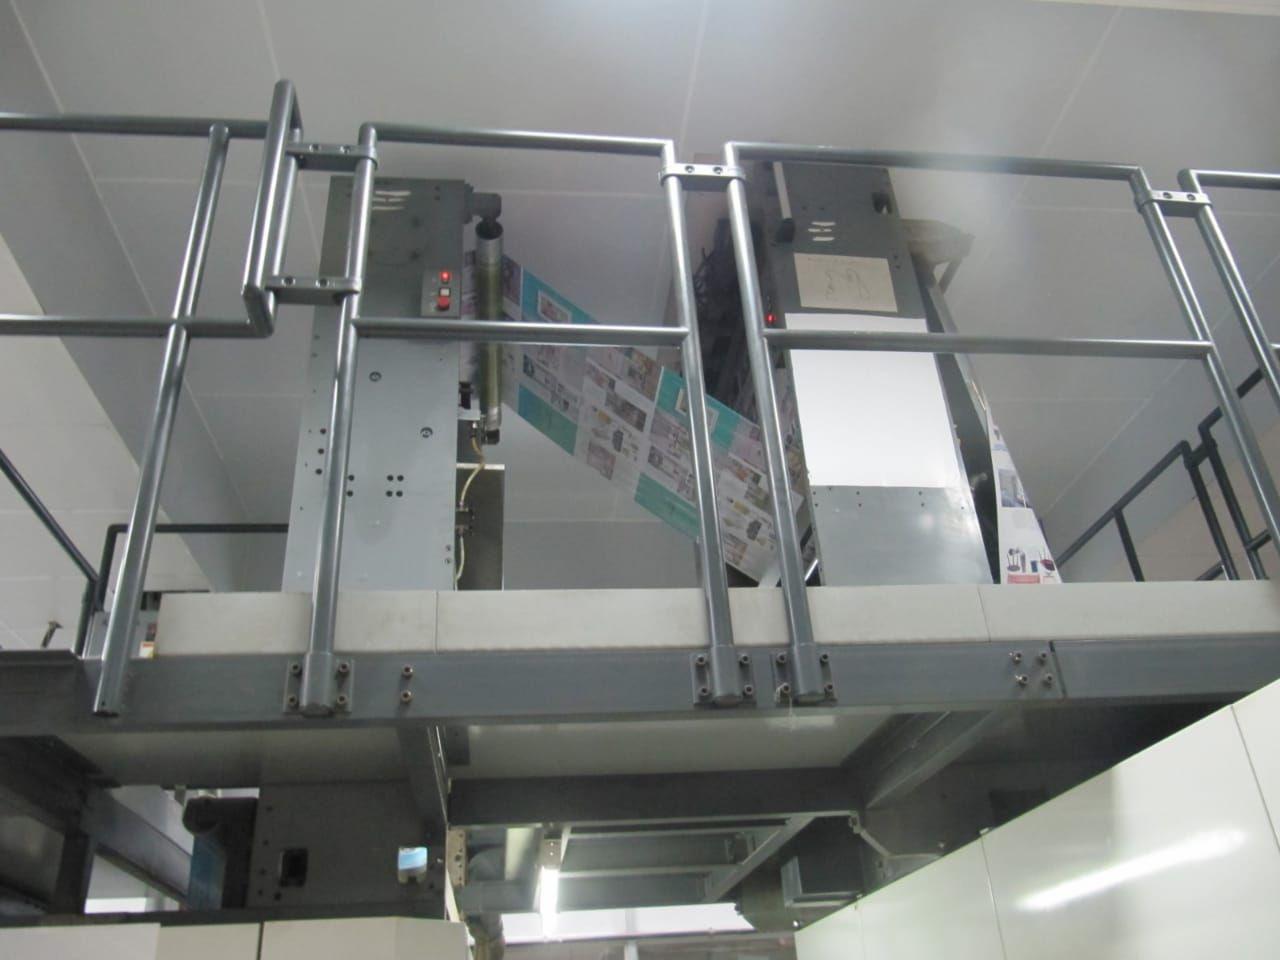 KOMORI SYSTEM 38 S, Jahr : 2011, ref.68788 | www.coci-sa.com/de | 68788n_5.jpg